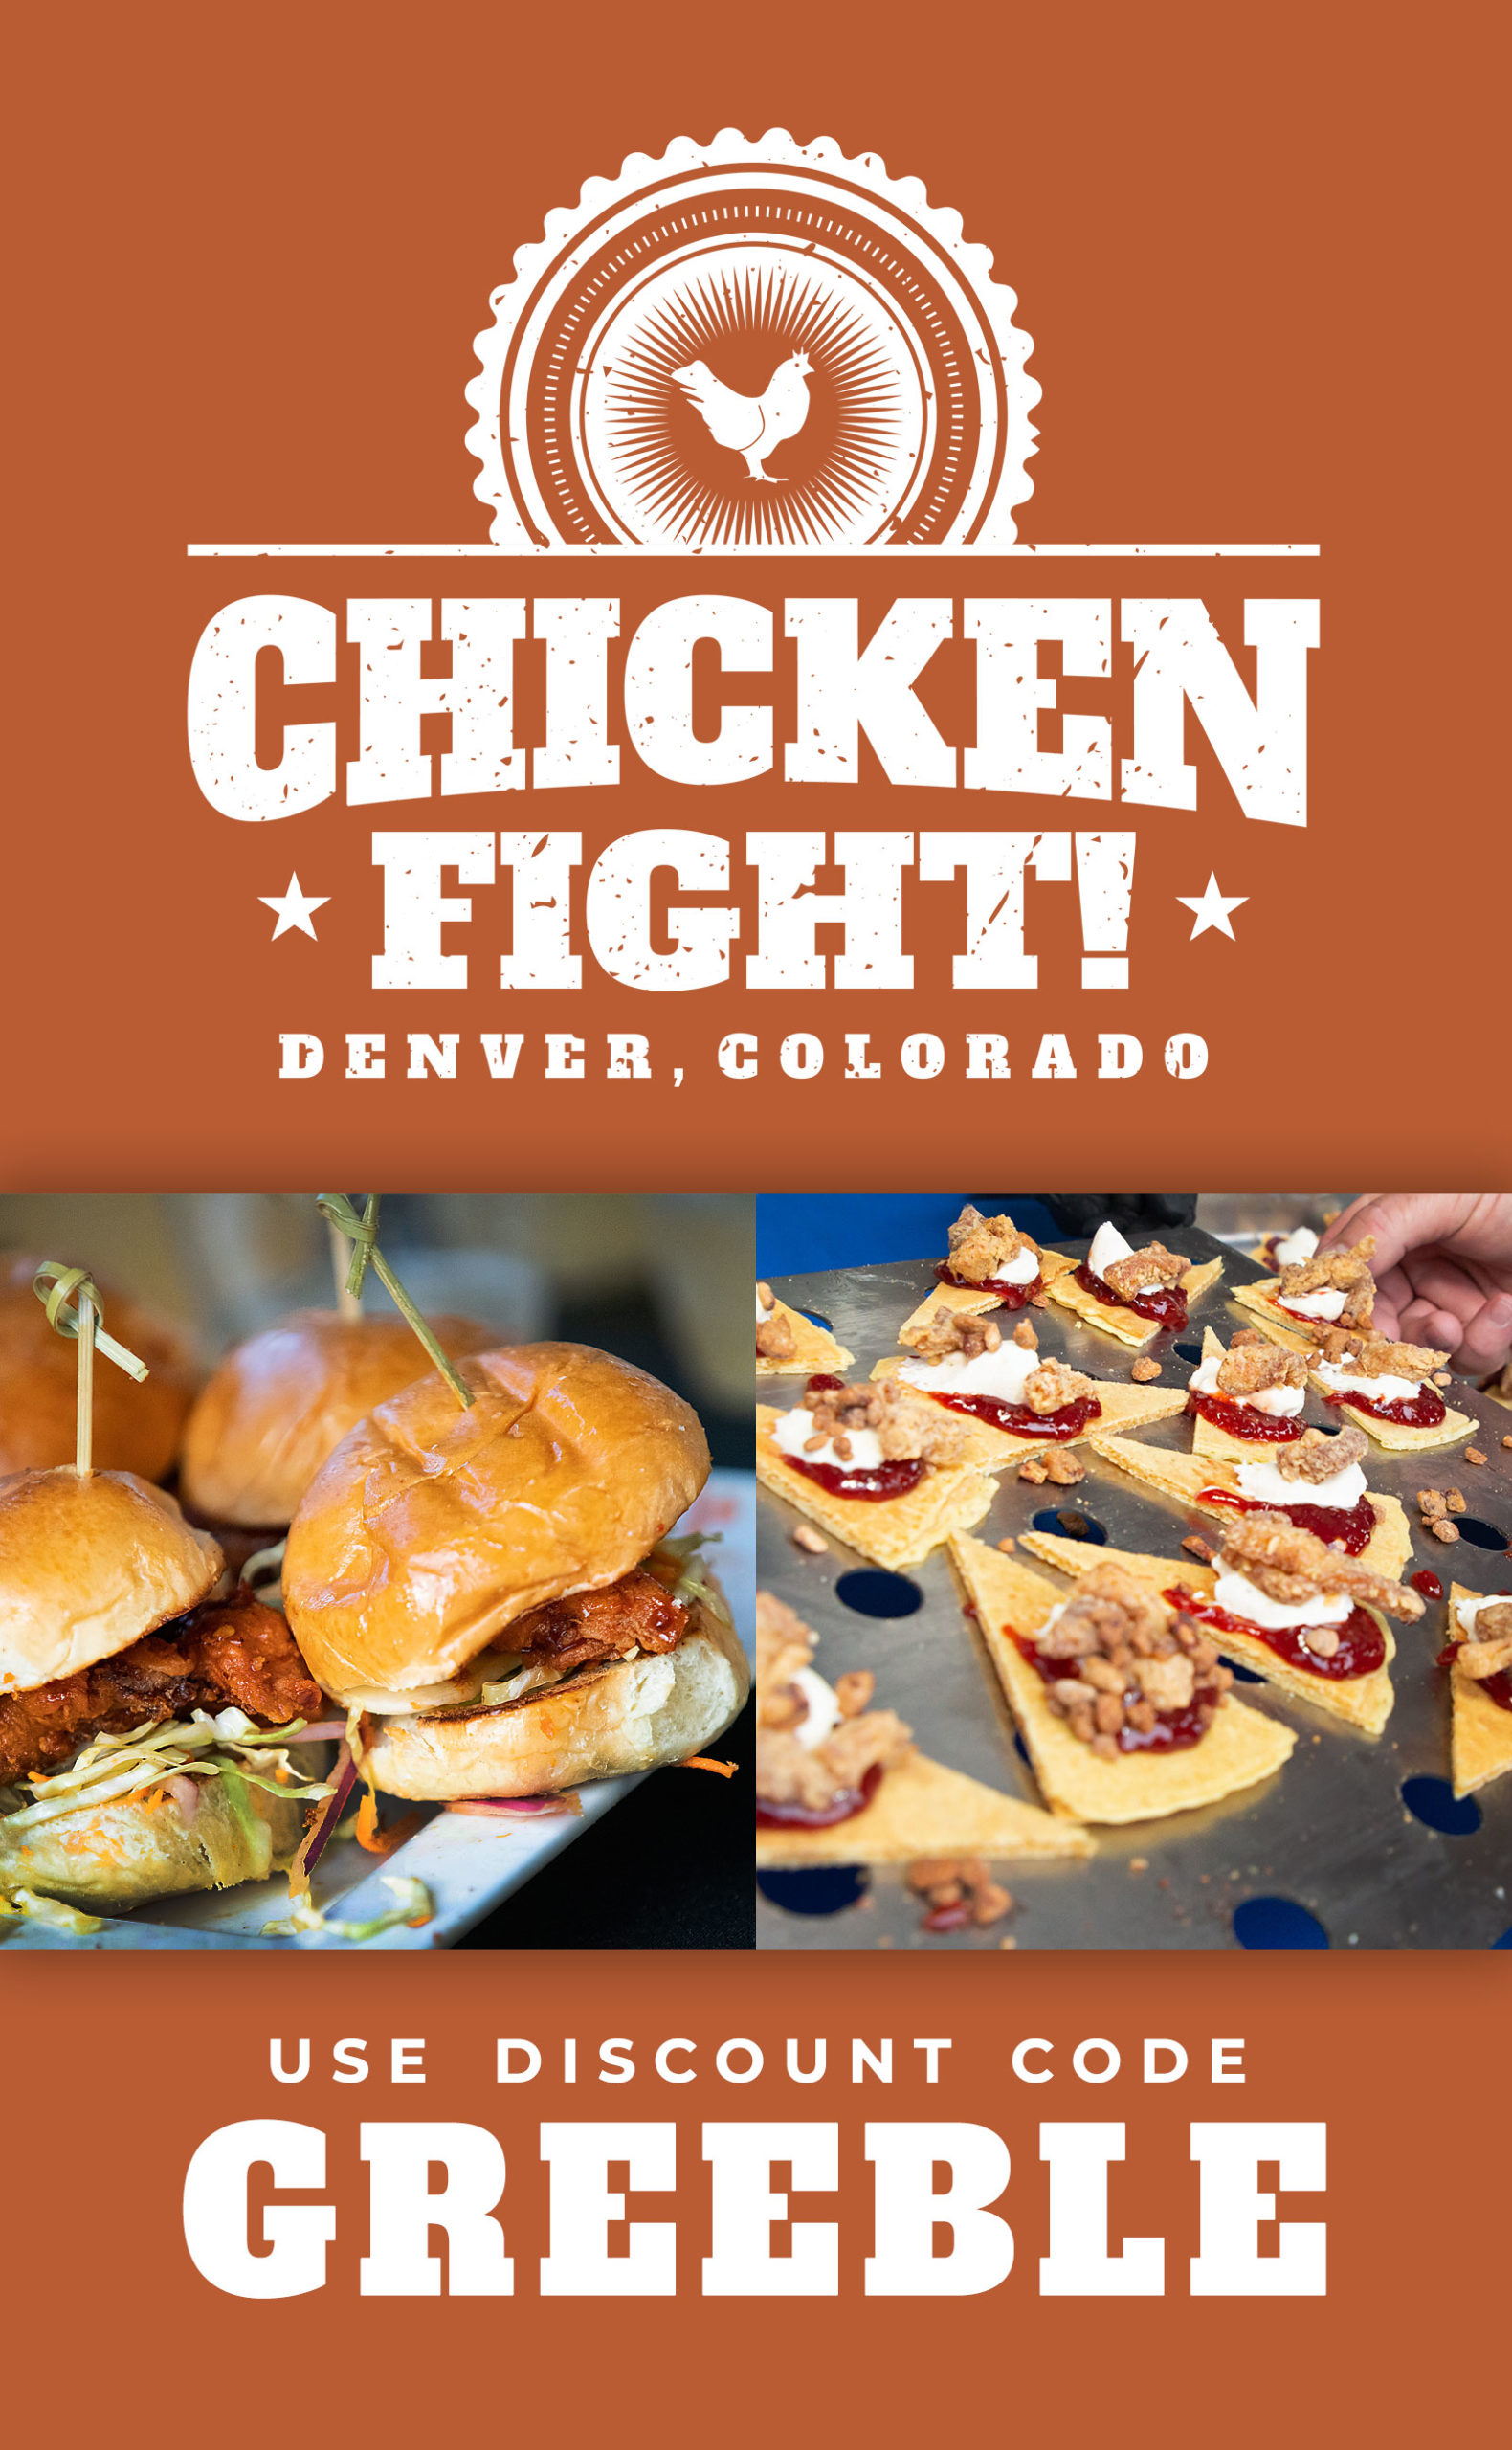 Chicken Fight Fest Denver 2020 - Discount Promo Code